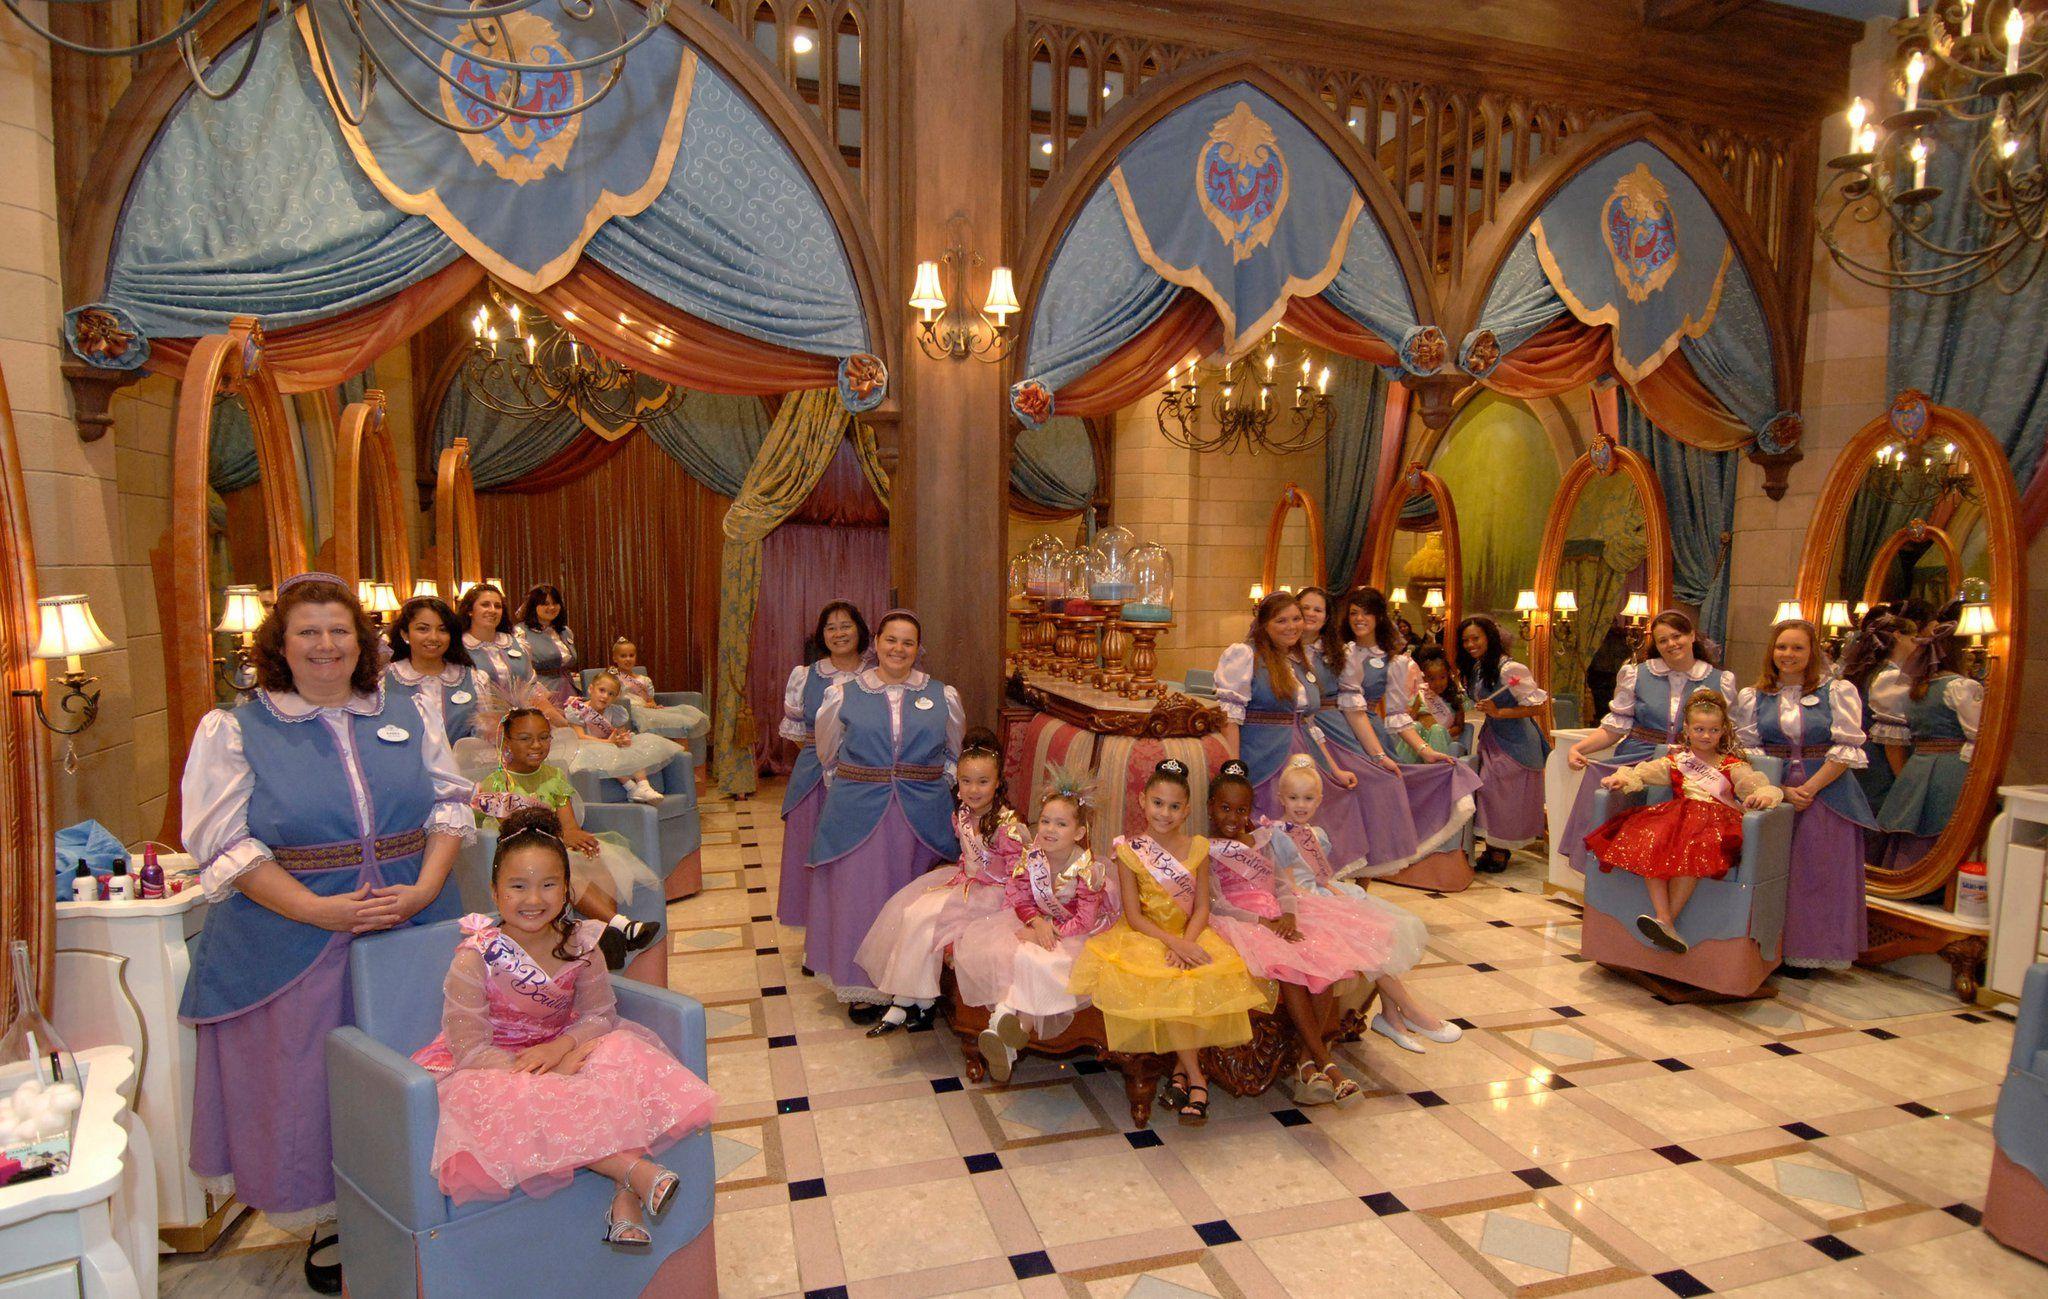 Bibbidi Bobbidi Boutique Bibbidi Bobbidi Boutique Disney World